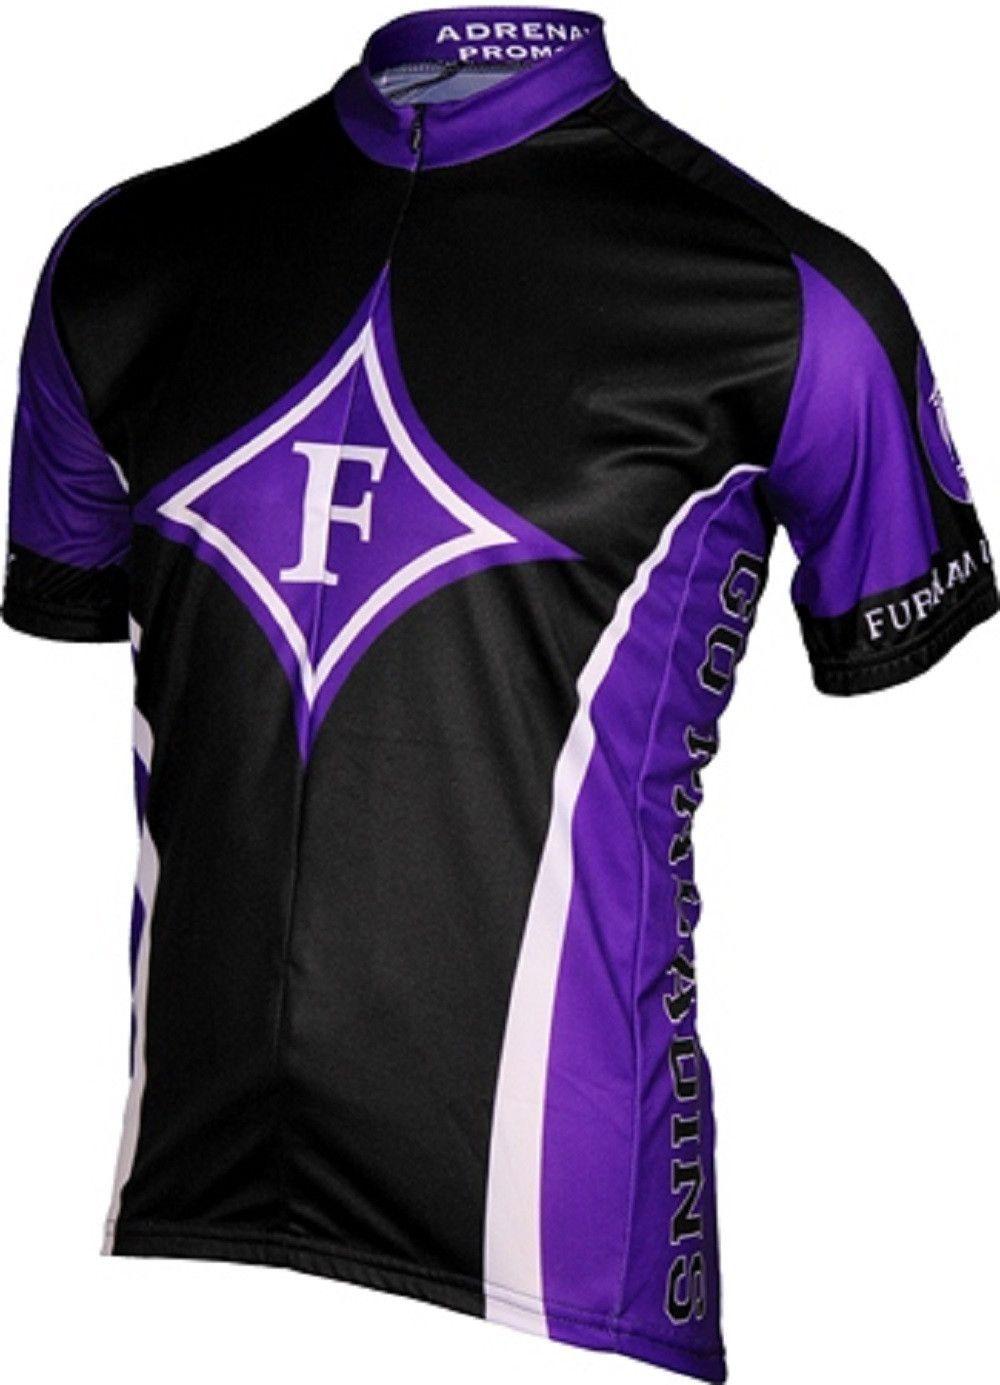 ceffbf466 NCAA Men s Adrenaline Promotions Furman Paladins Cycling Jersey ...